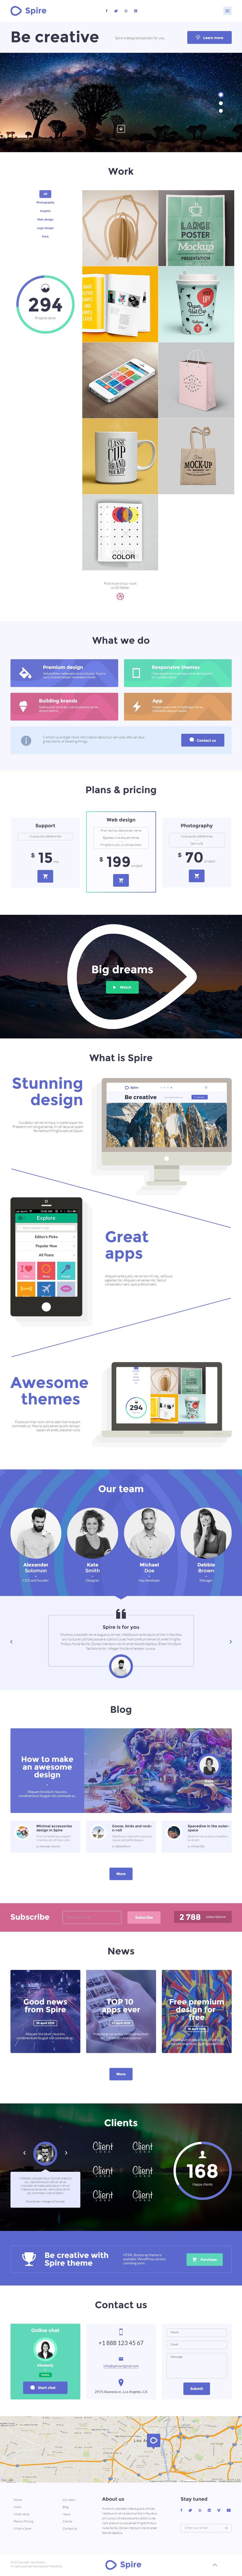 Spire Premium Responsive Creative Agency HTML5 Template